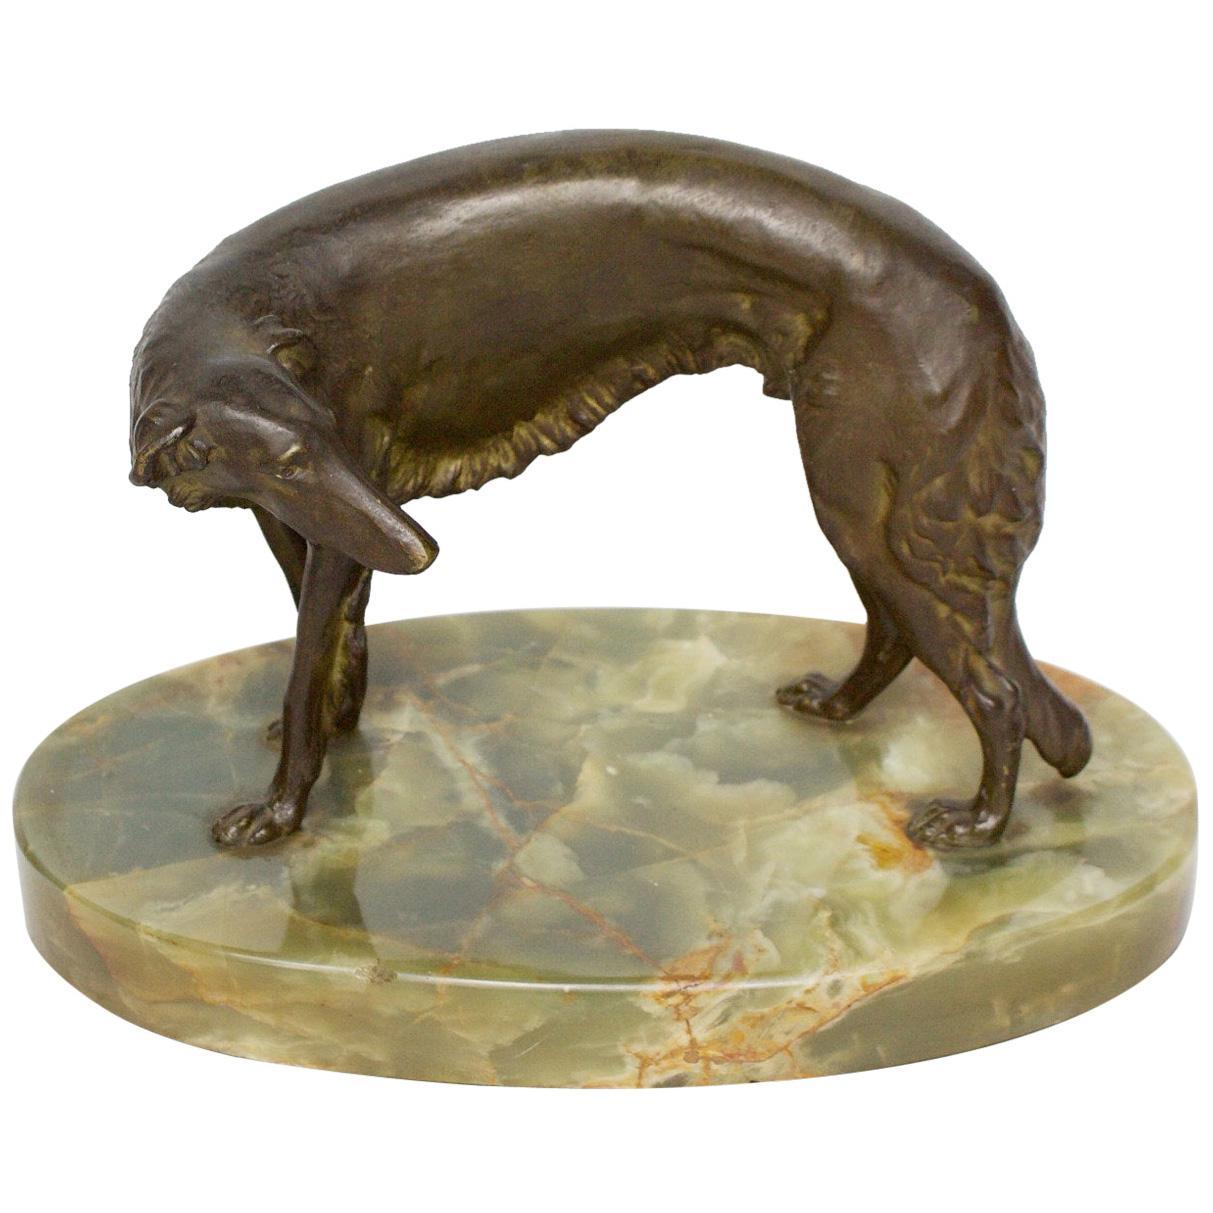 Early 20th Century Bronze Sculpture of a Borzoi Dog by Wilhelm Bormann